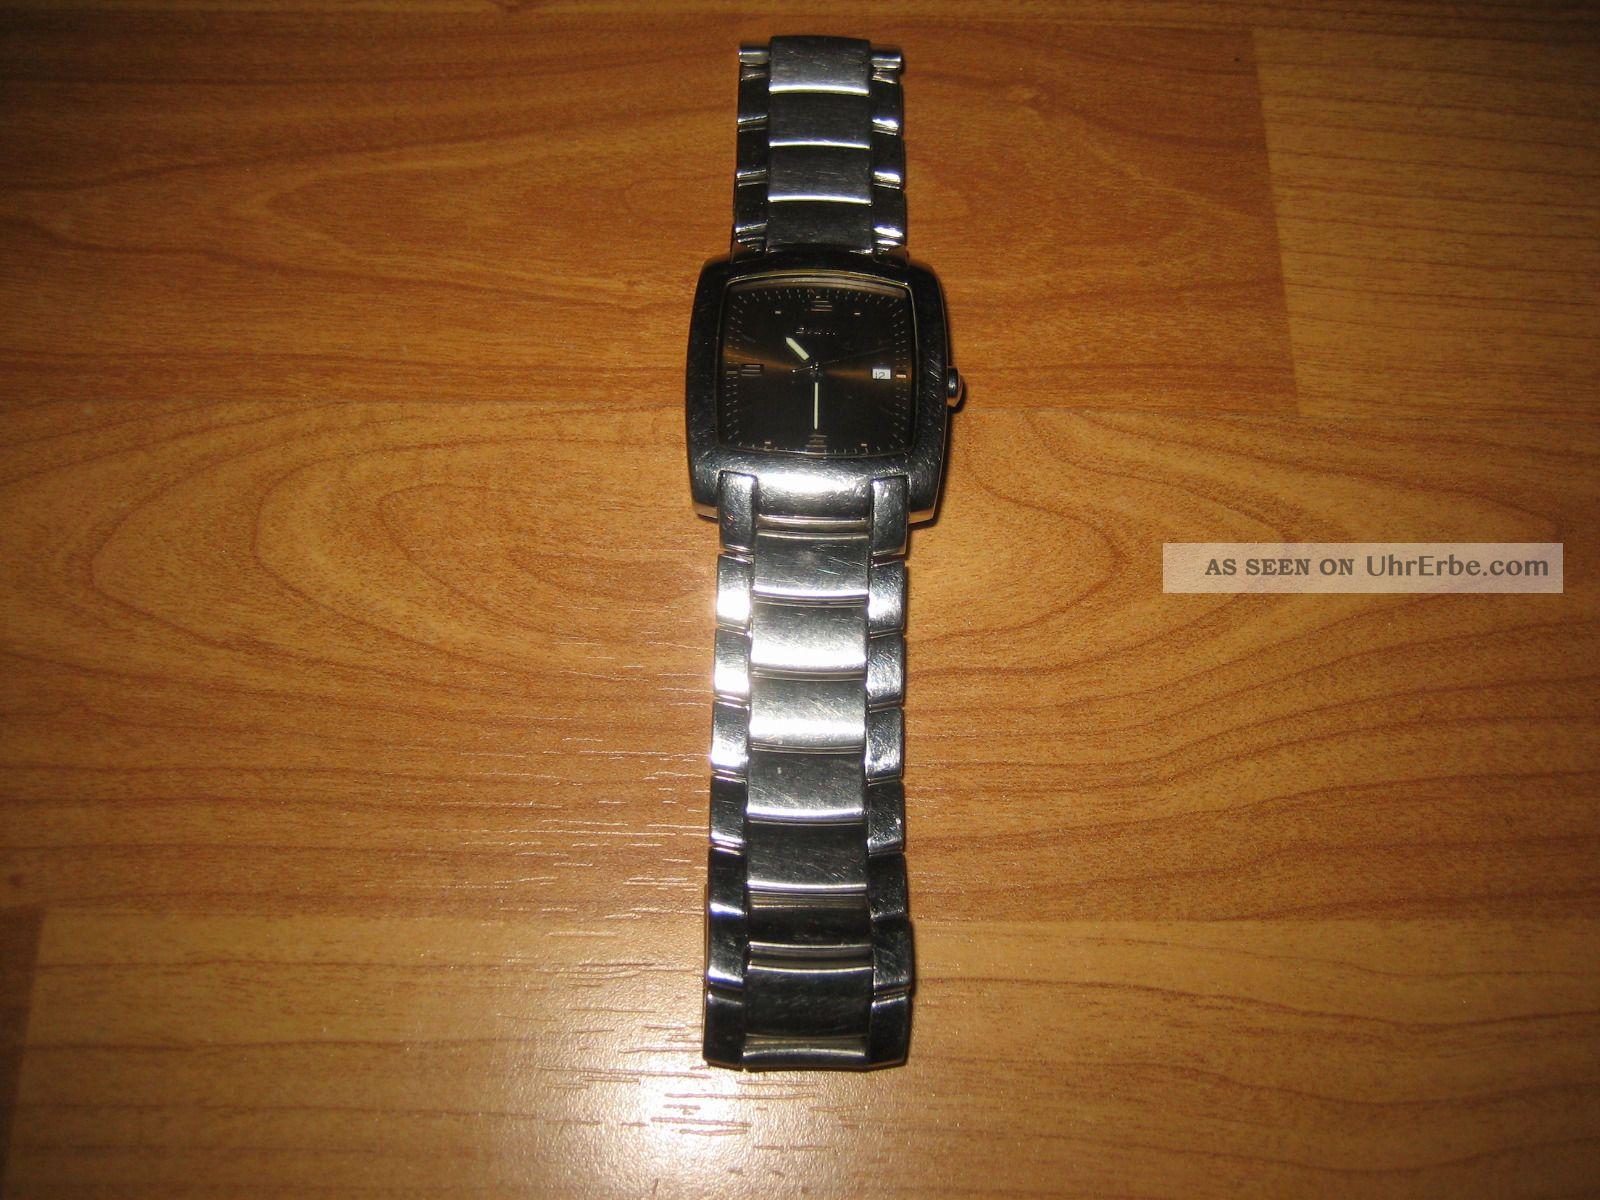 Dkny Herrenquarzuhr,  Nicht Geprüft,  Gehäuse Und Armband Edelstahl,  Ny 1093 Armbanduhren Bild